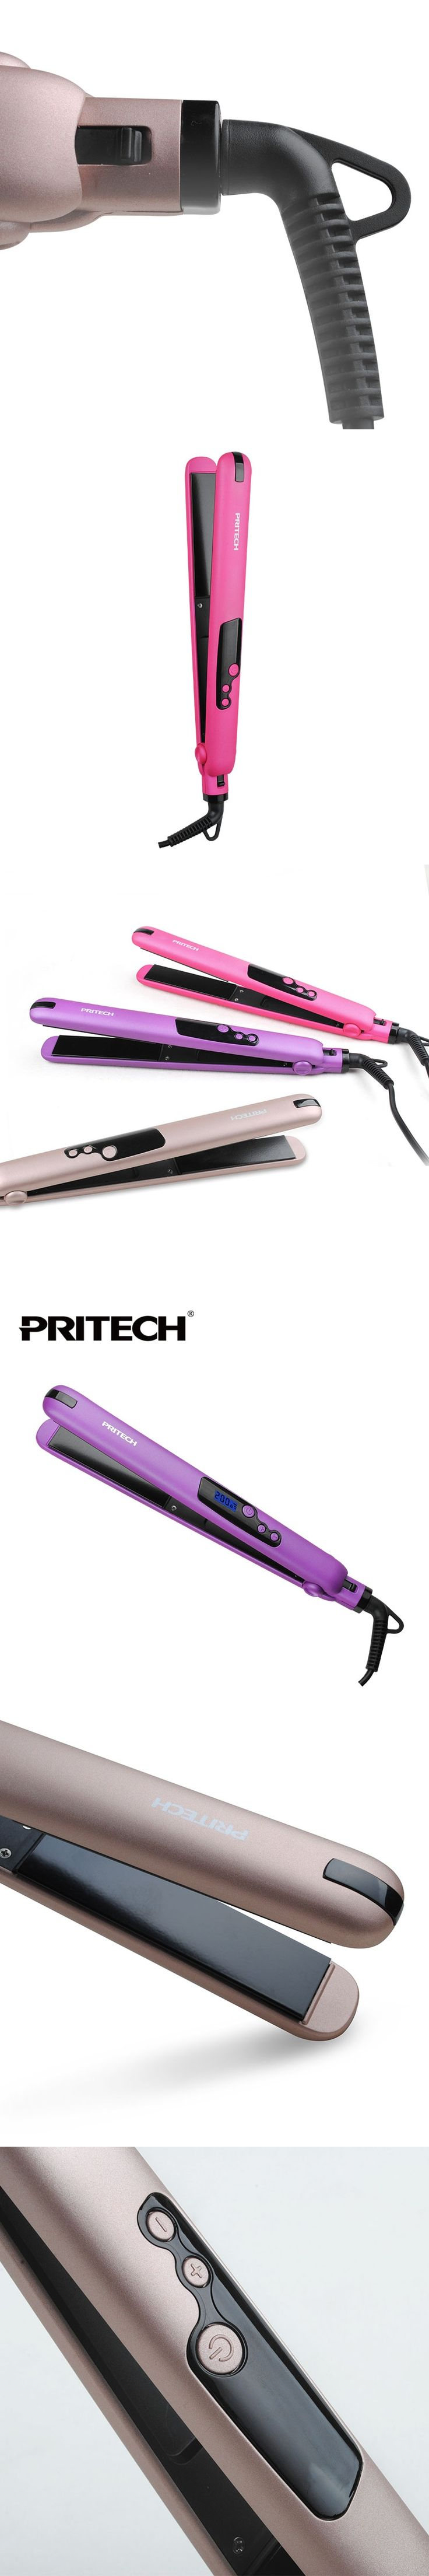 PRITECH Brand Fashion Hair Straightener Travel Hair Straightener Portable Hair Flat Iron Hair Styling Tools Color Random